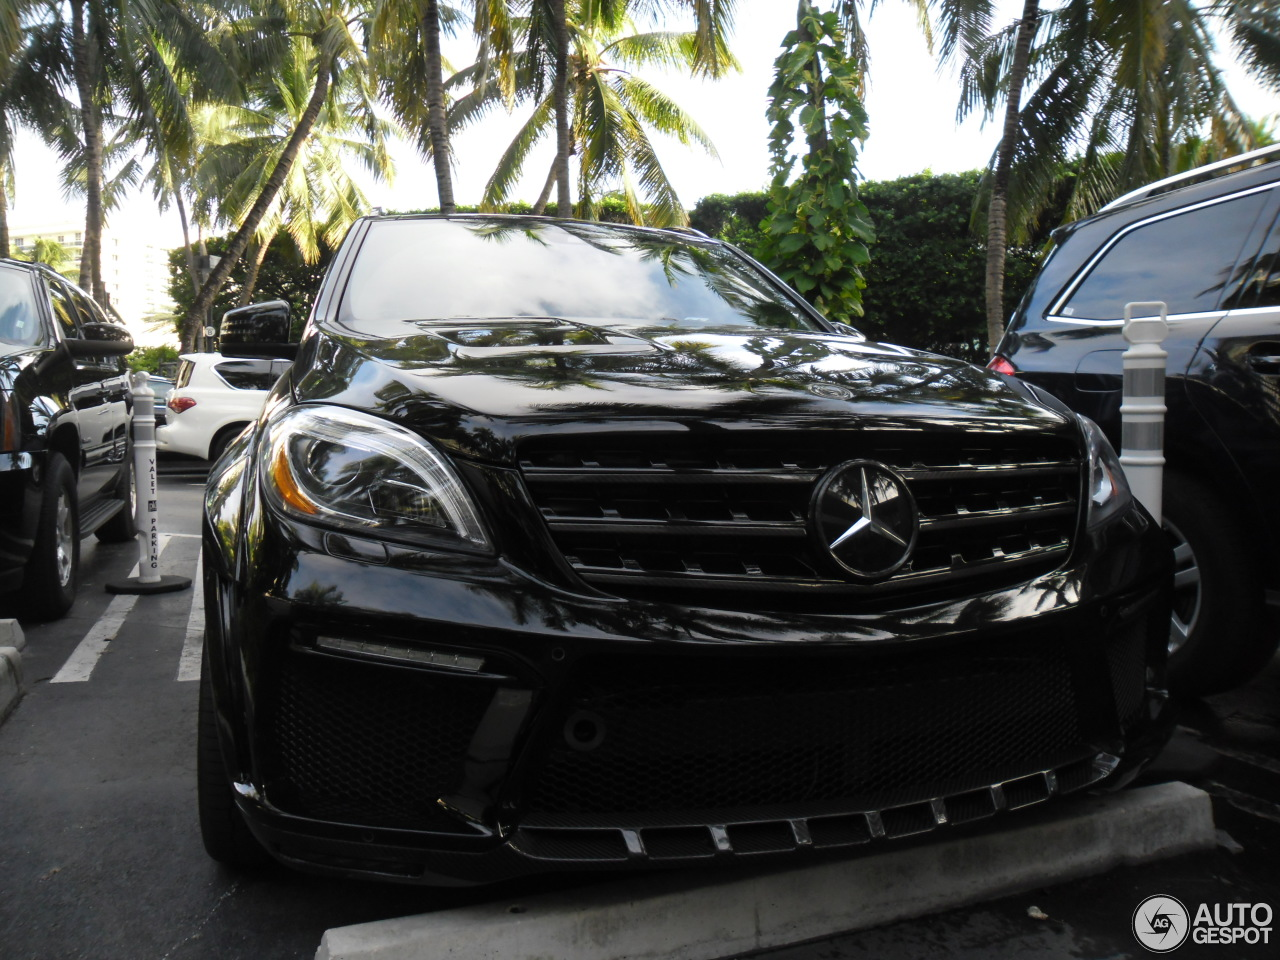 Inferno Exotic Car 2017 >> Mercedes-Benz Top Car Inferno - 13 November 2013 - Autogespot